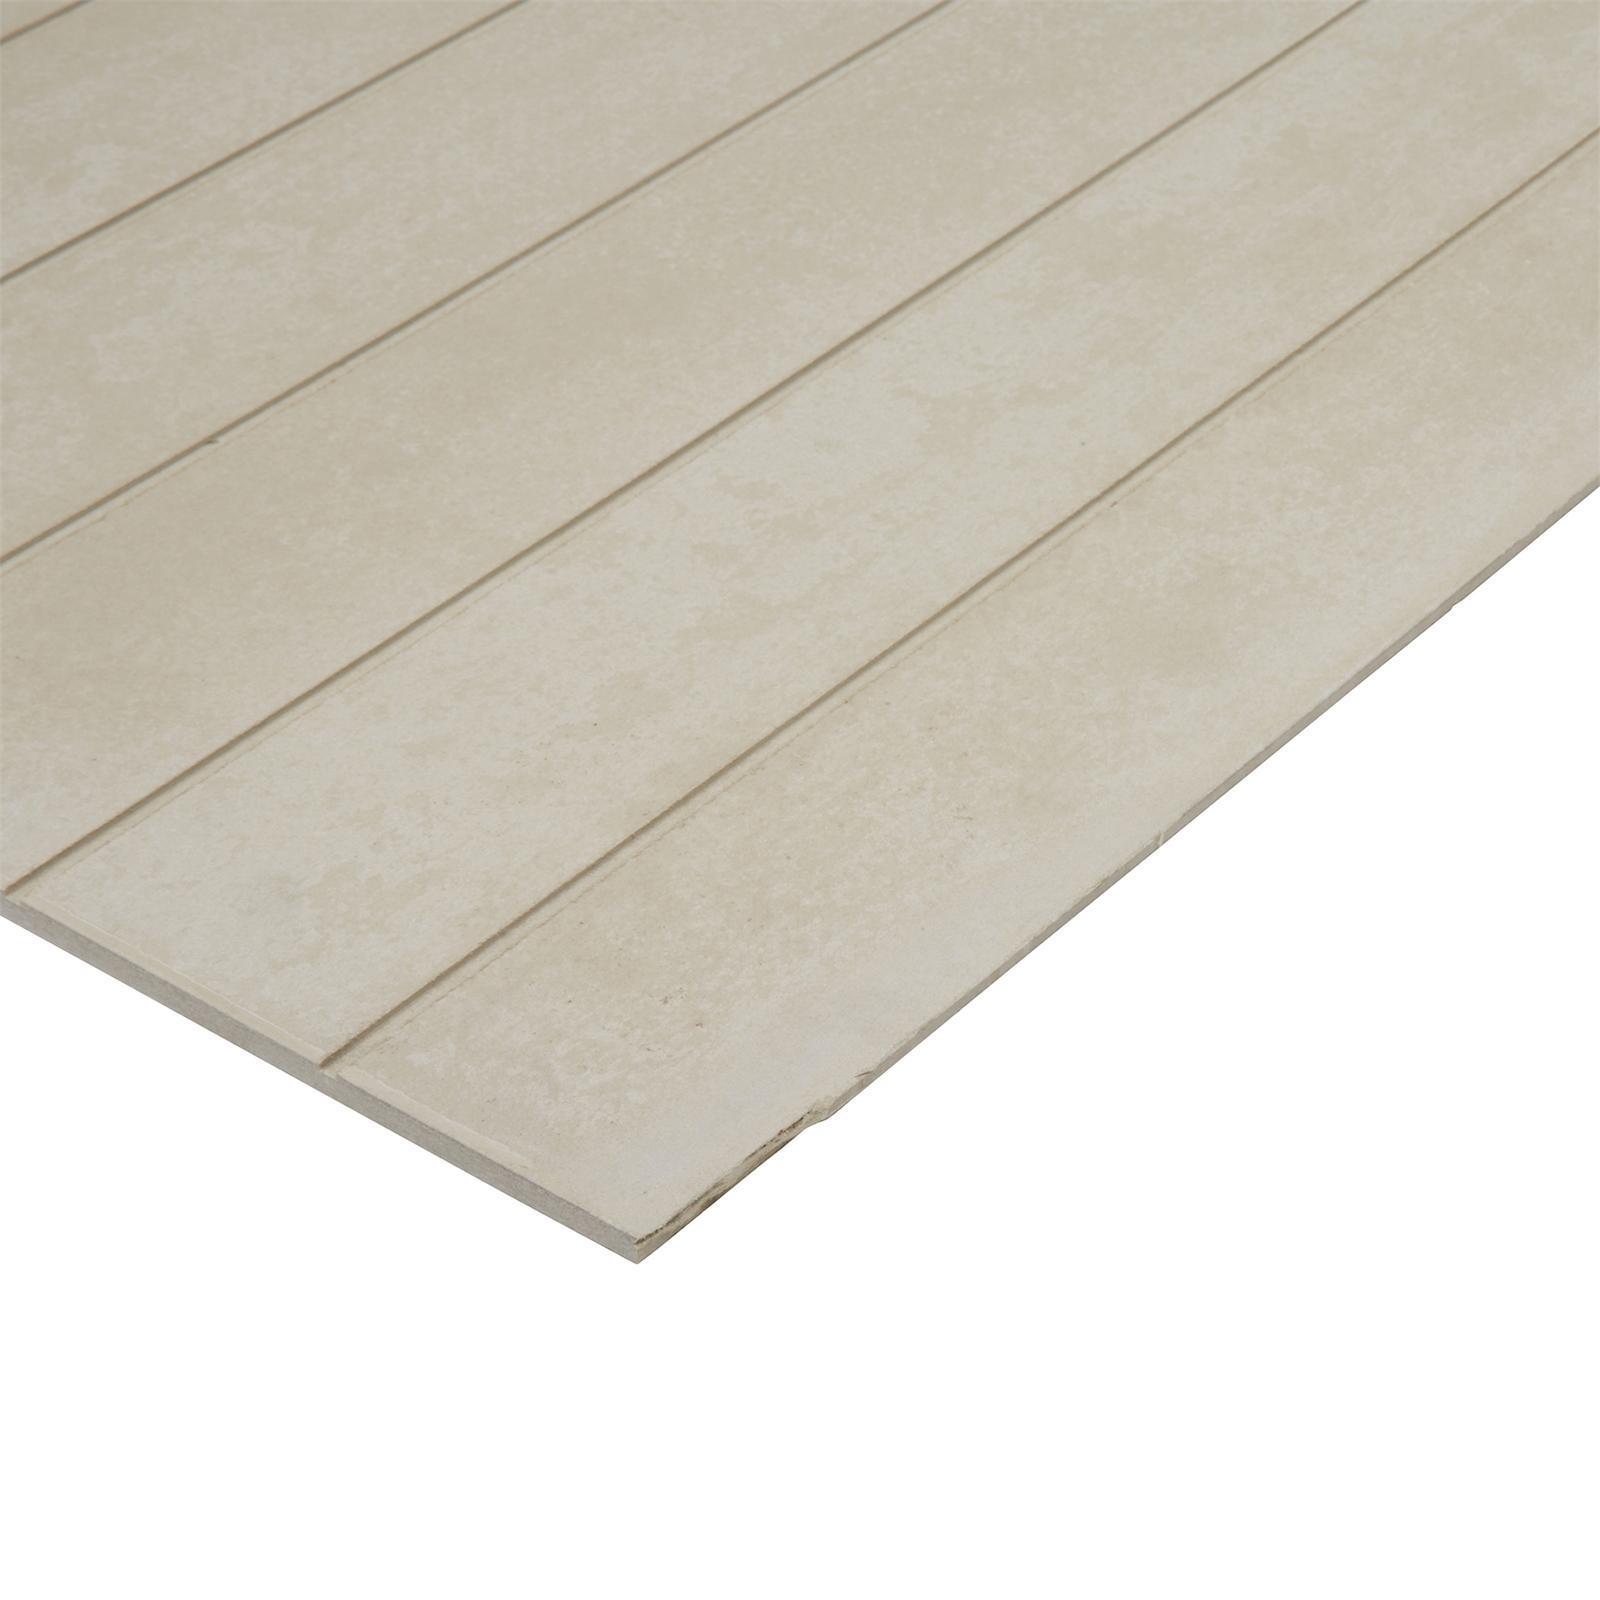 BGC Duragroove Smooth Narrow 2450x1200x9mm Fibre Cement Sheet